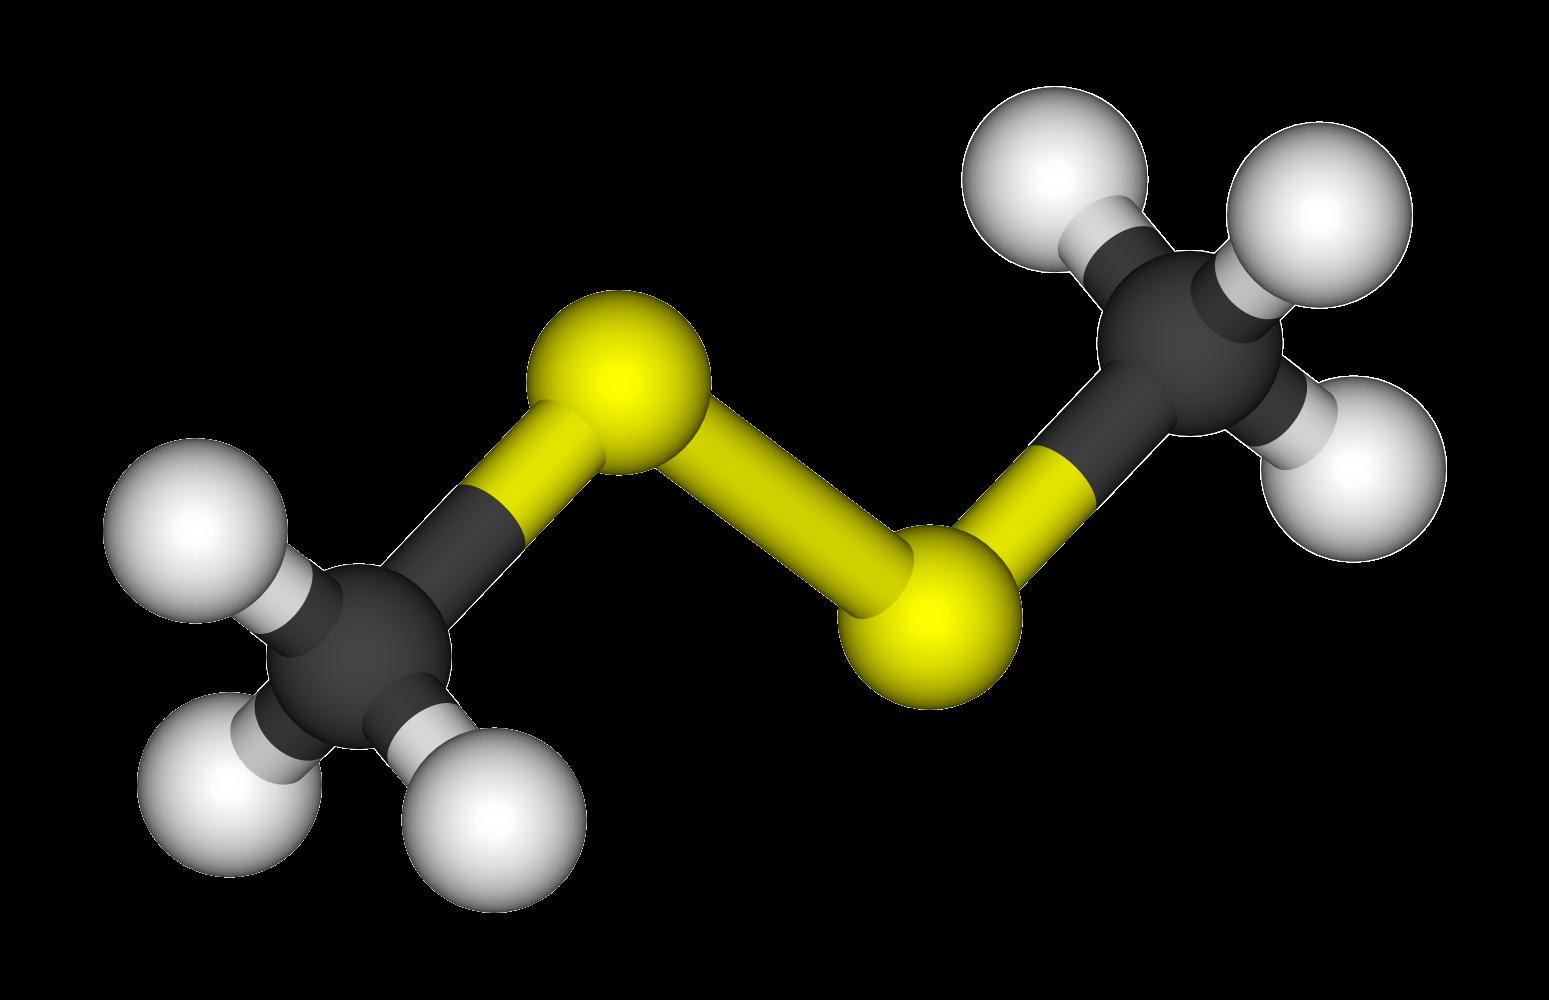 Gas clipart petrochemical. Dimethyl disulfide dmds an